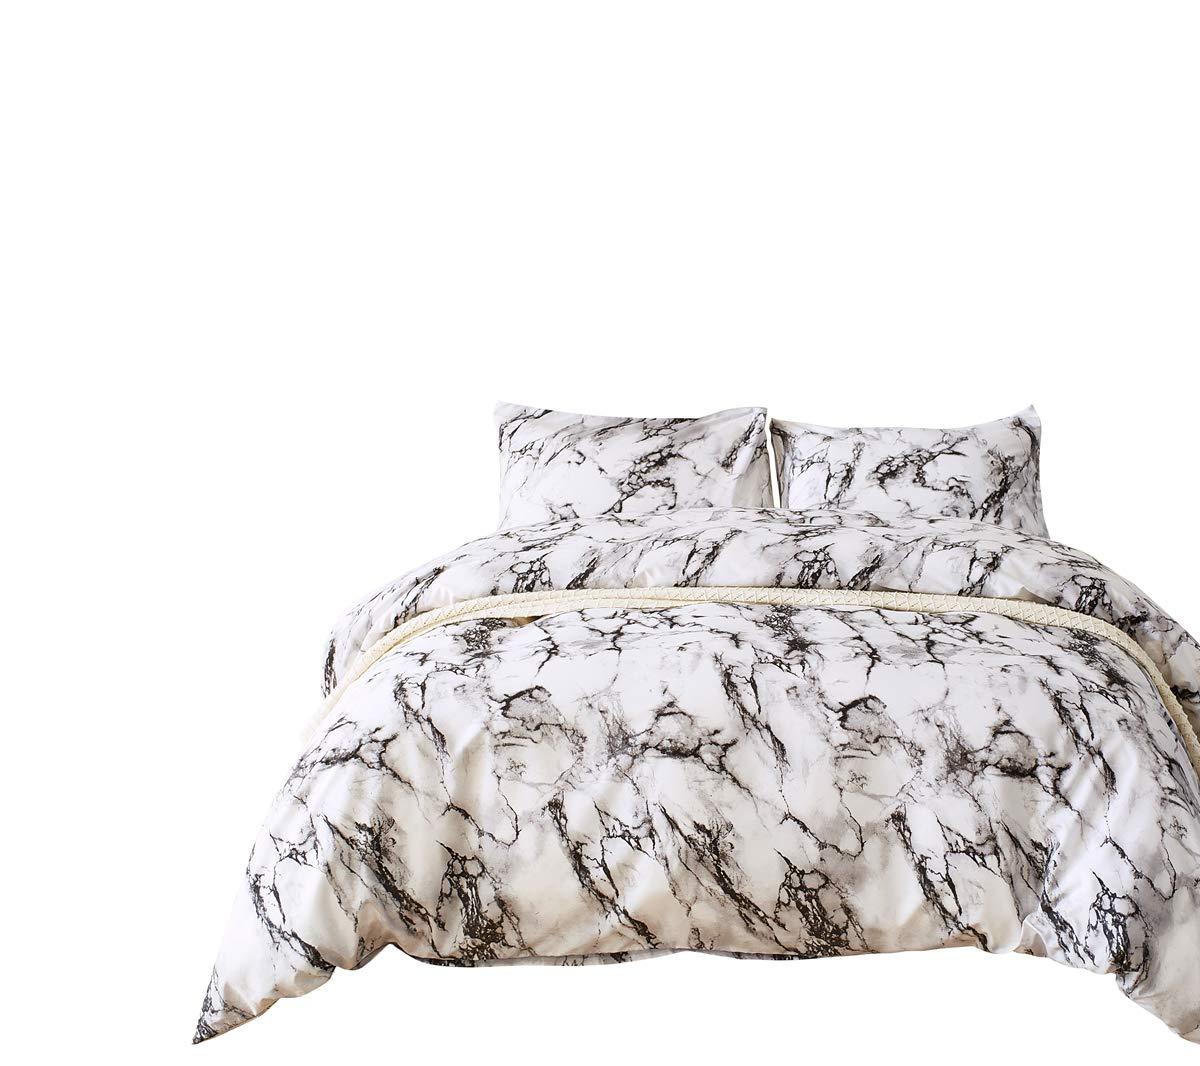 RheaChoice Marble Design 2 Piece Duvet Cover Set boys girls,Twin (68''x90'')-(1 Duvet Cover + 1 Pillow Shams)-Ultra Soft Hypoallergenic Microfiber